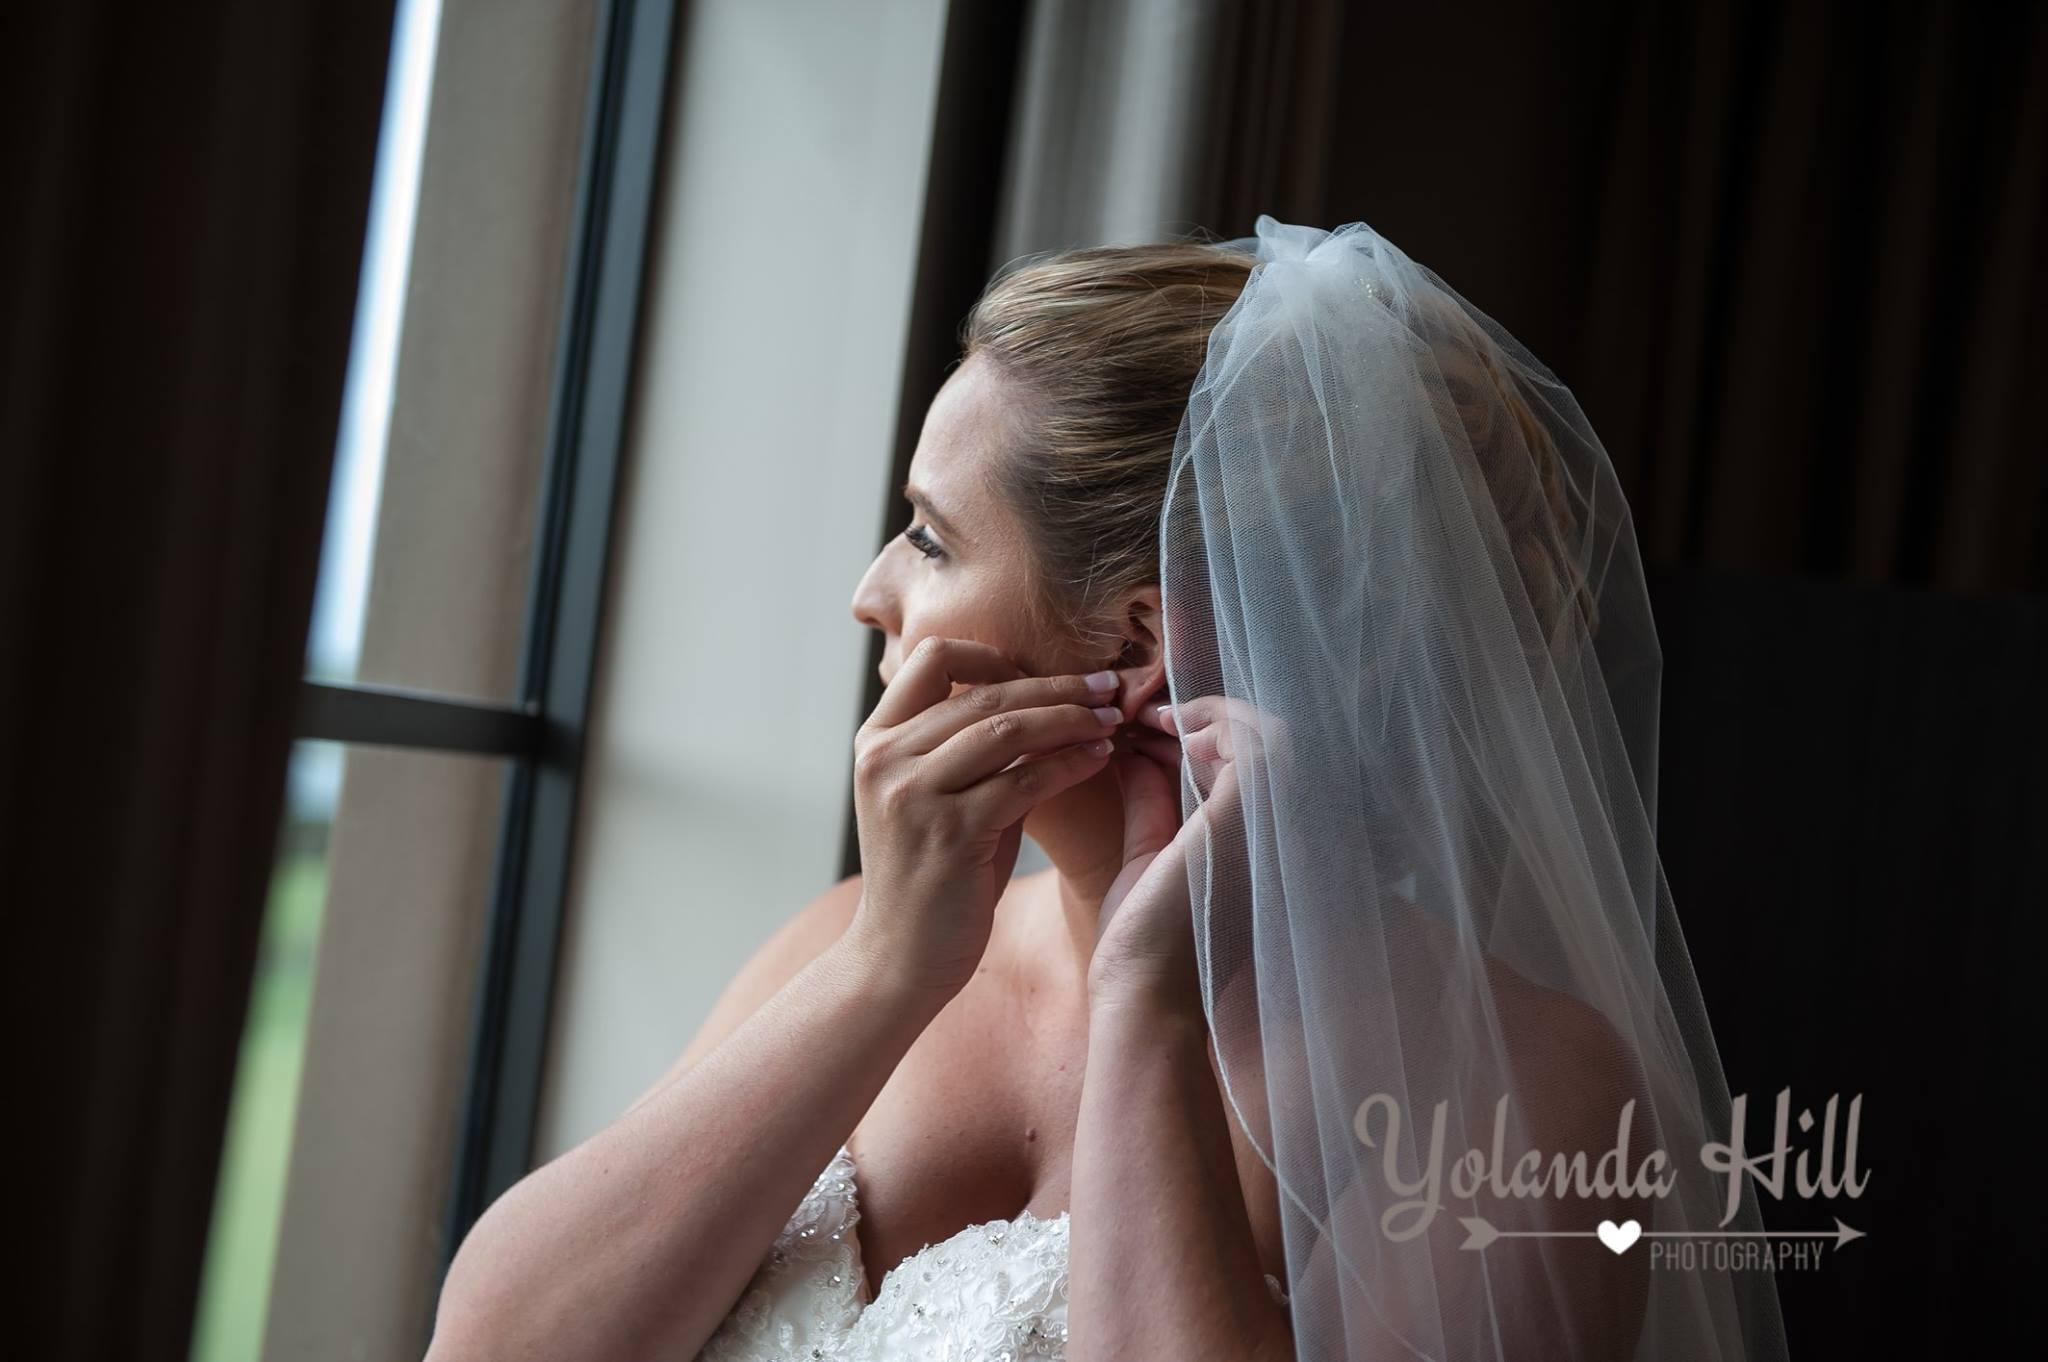 Photo Credit: Yolanda Hill Photography